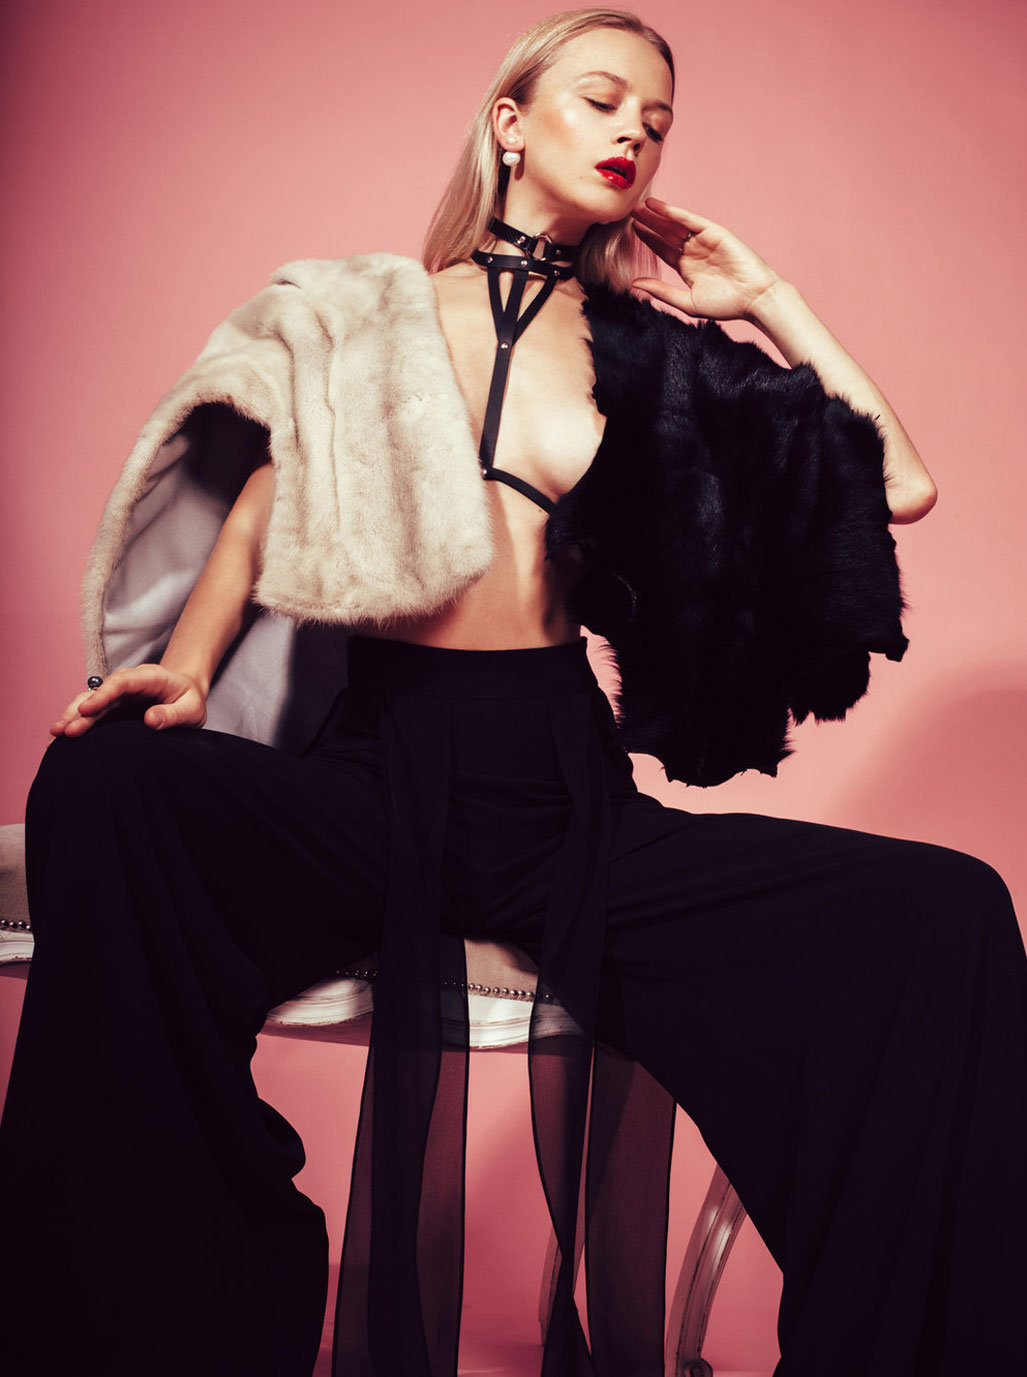 Светлана Легун в рекламной кампании Wicca collection 2016 / фото 14